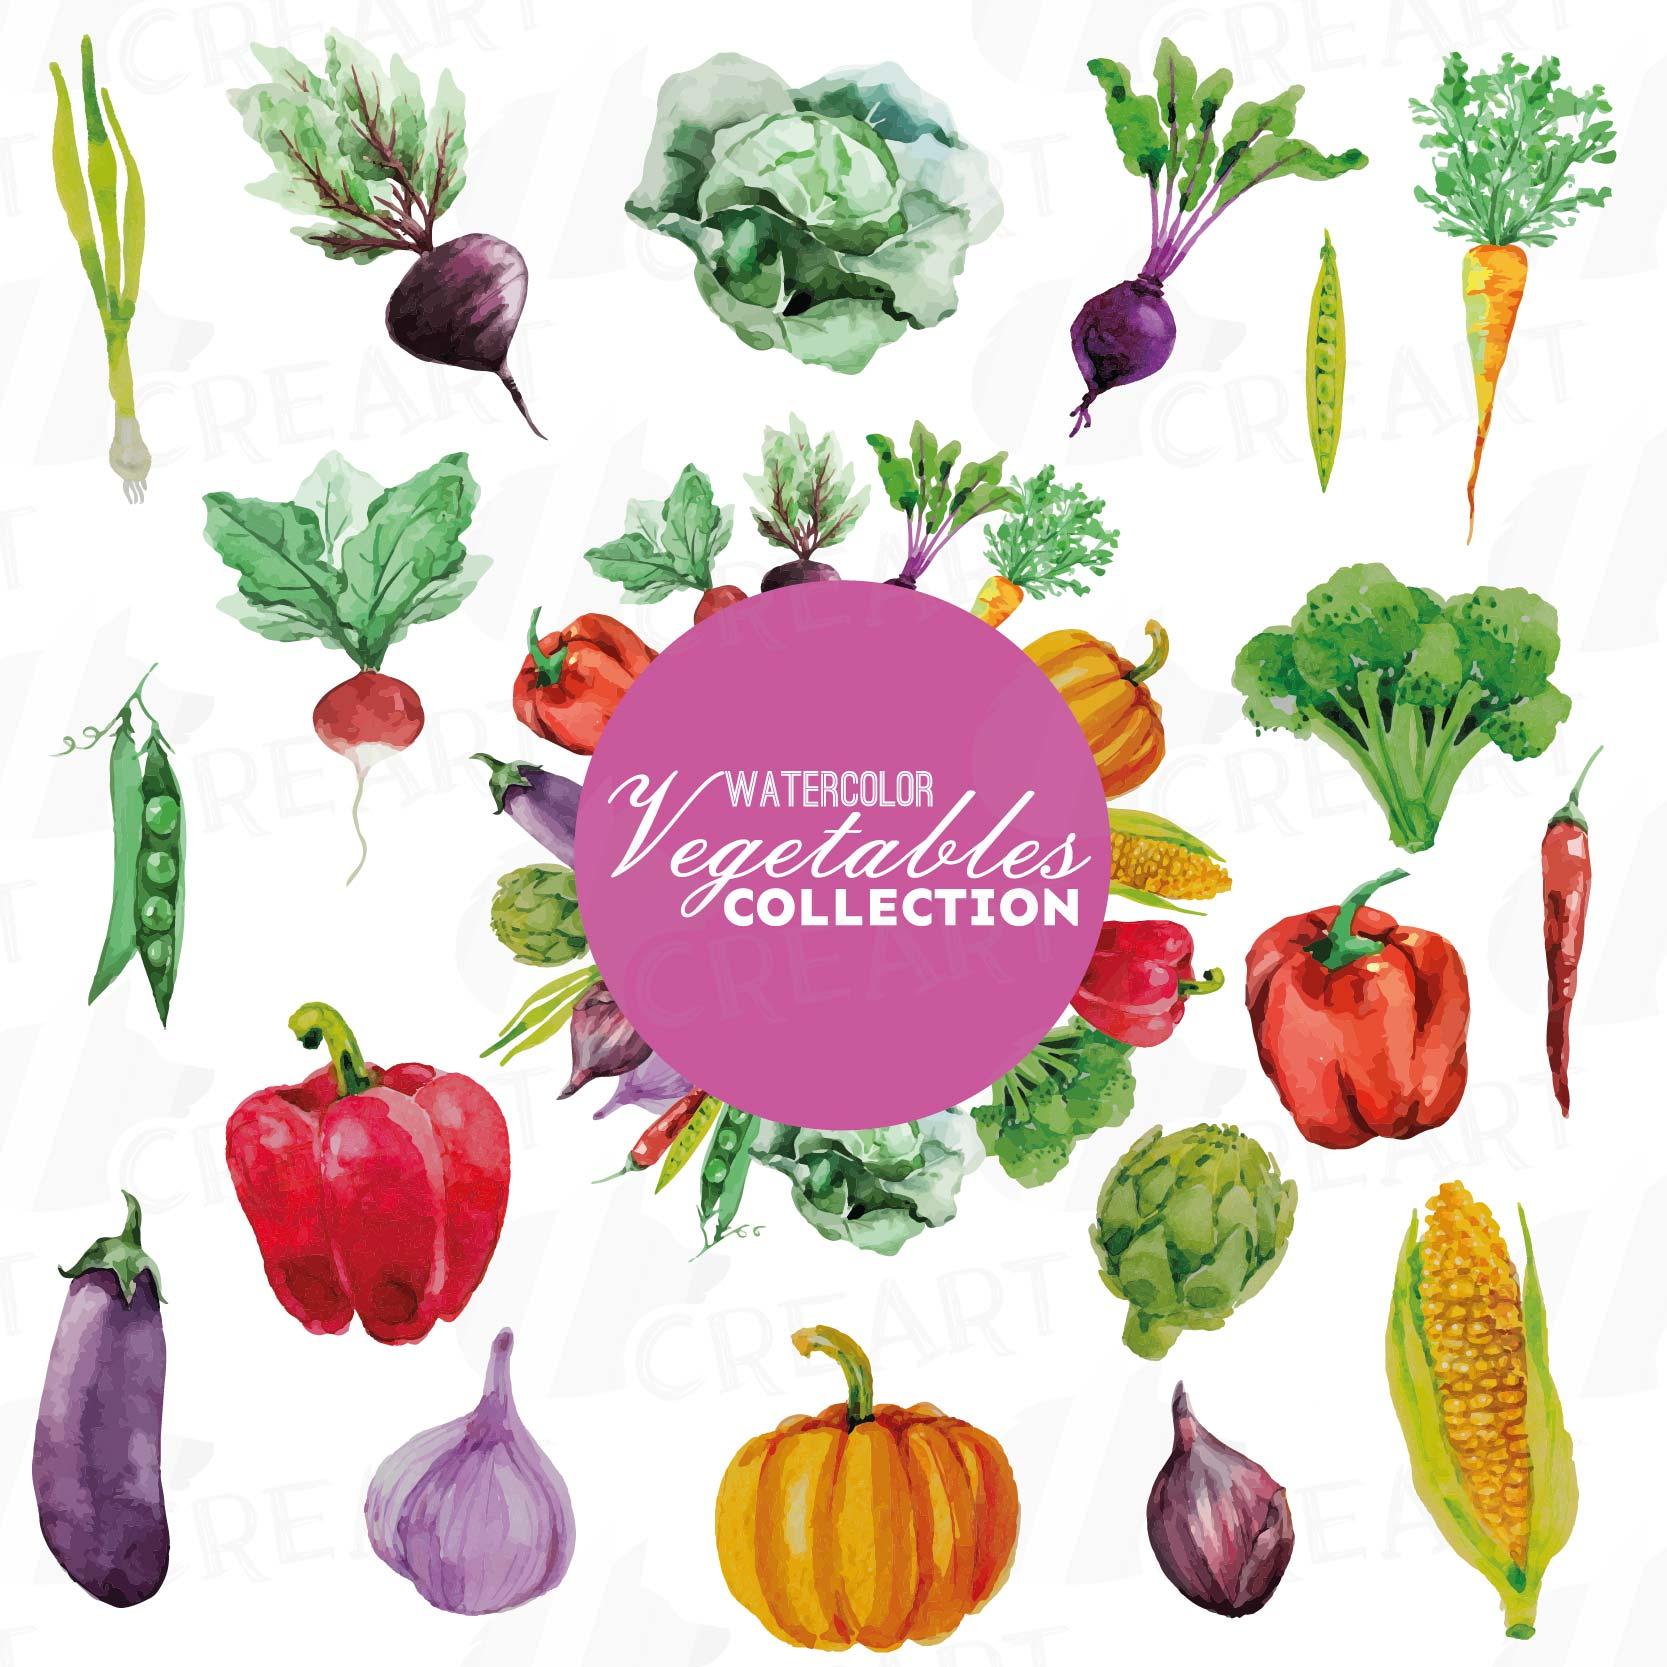 Watercolor Vegetables Clip Art Pack Green And Colorful Vegetables Healthy Food Eps Png Jpg Svg Vector Files Included Instant Download 101362 Illustrations Design Bundles